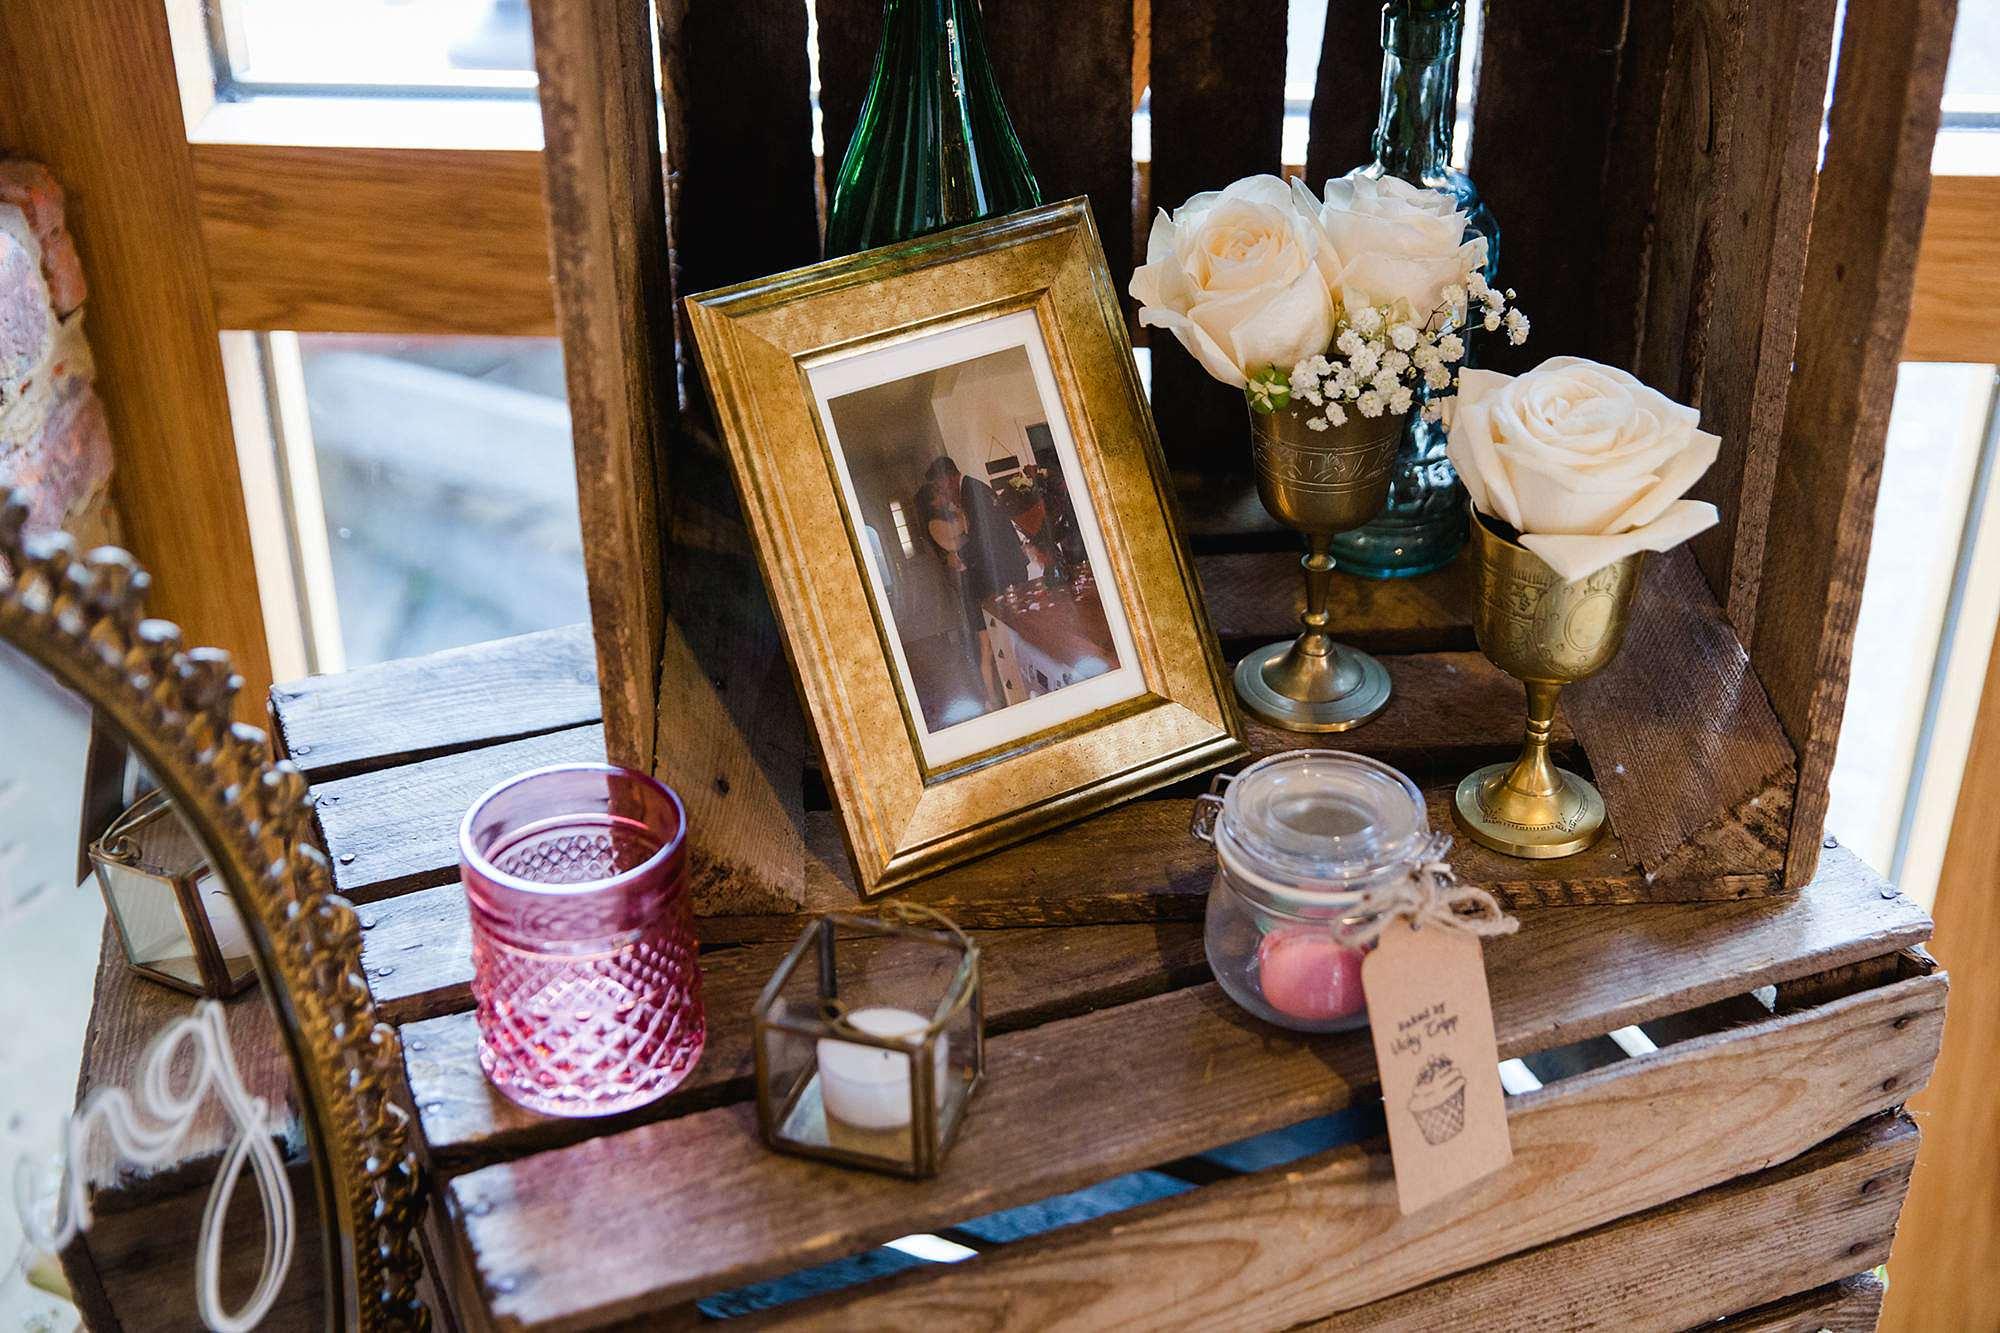 Lillibrooke Manor wedding rustic decorations